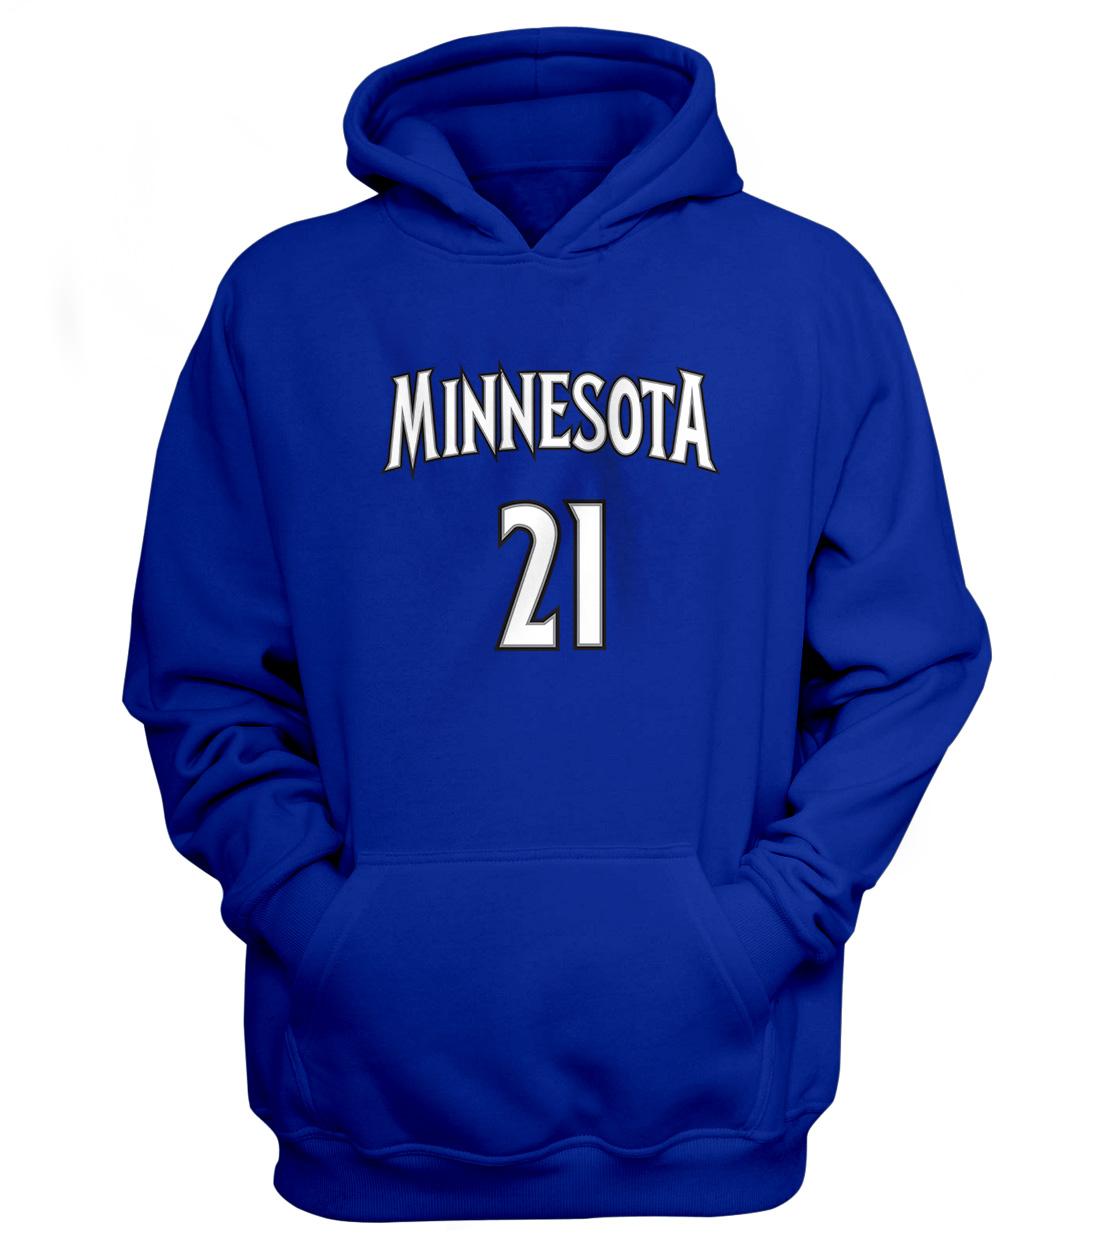 Minnesota Timberwolves Minnesota Kevin Garnett Hoodie (HD-BLU-180-PLYR-MIN-GARNETT.FRM)